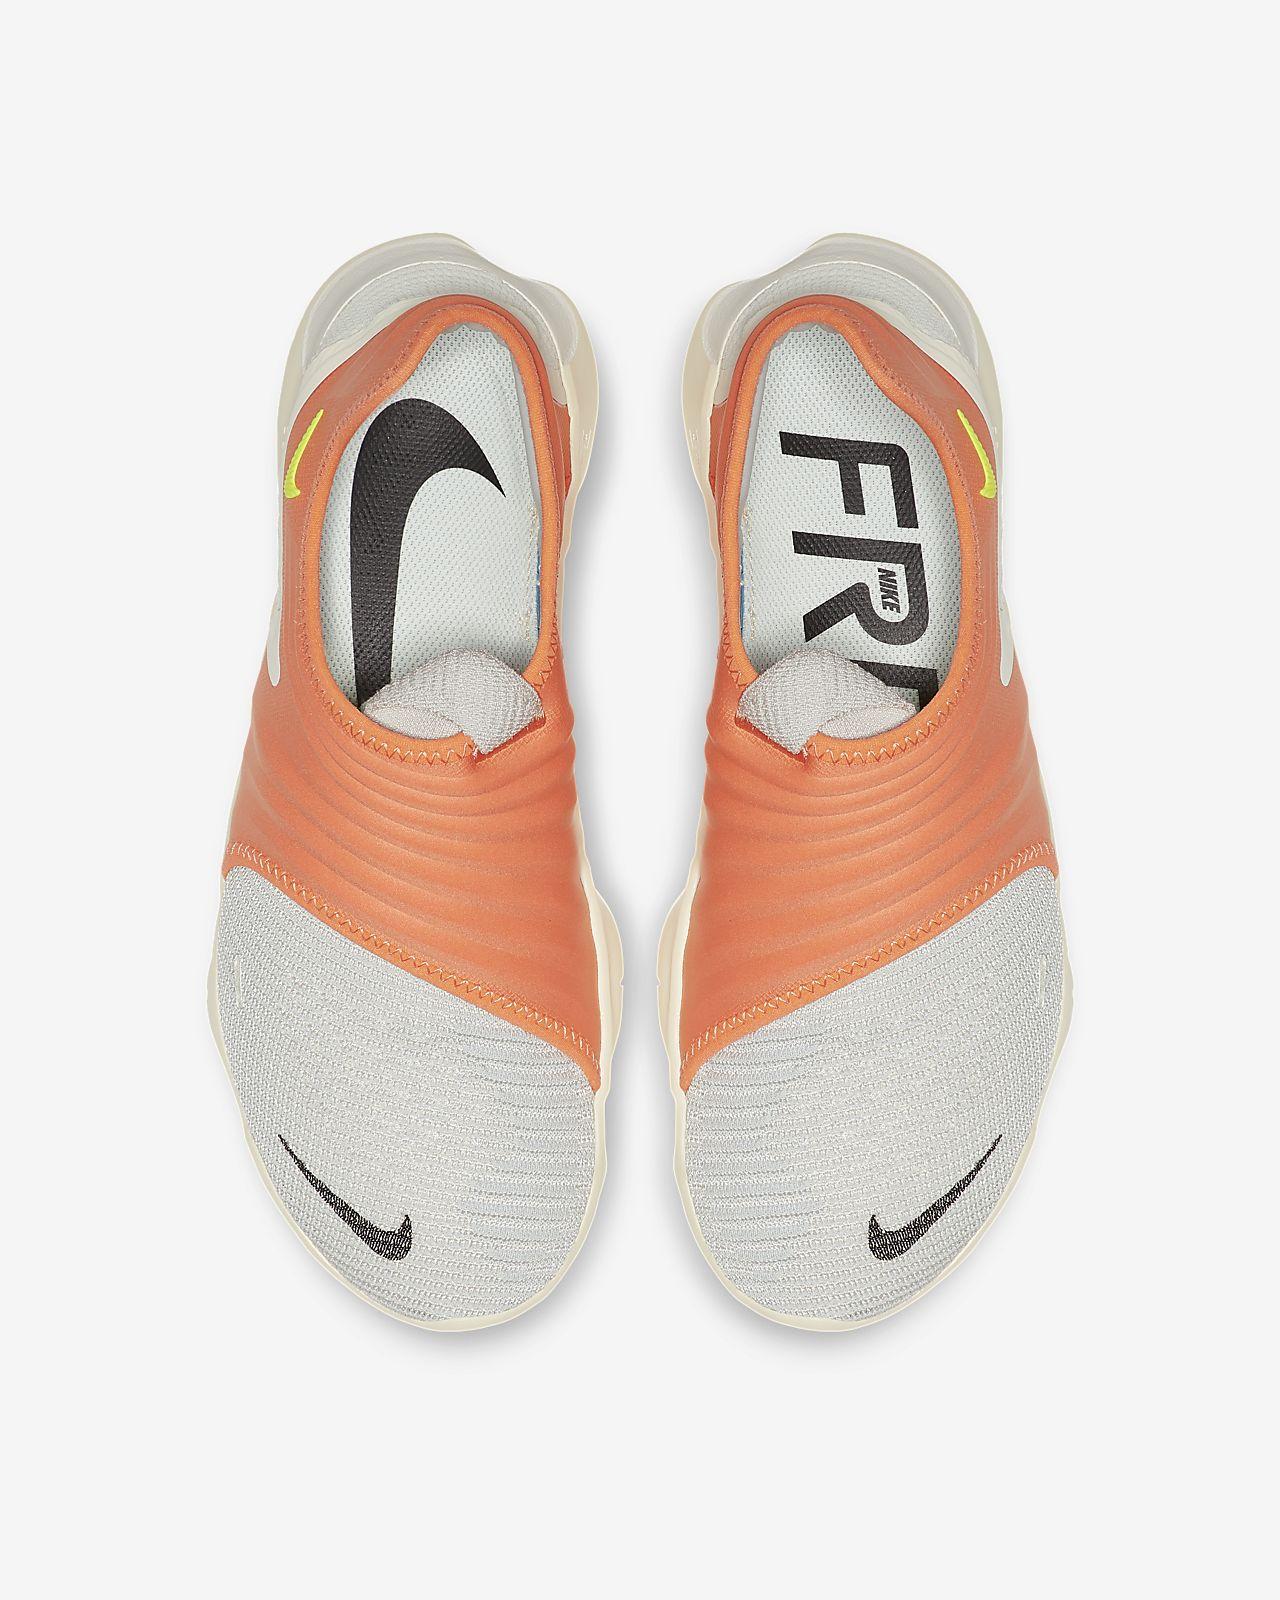 Nouveaux produits 1c62d 28a89 Nike Free RN Flyknit 3.0 NRG Men's Running Shoe